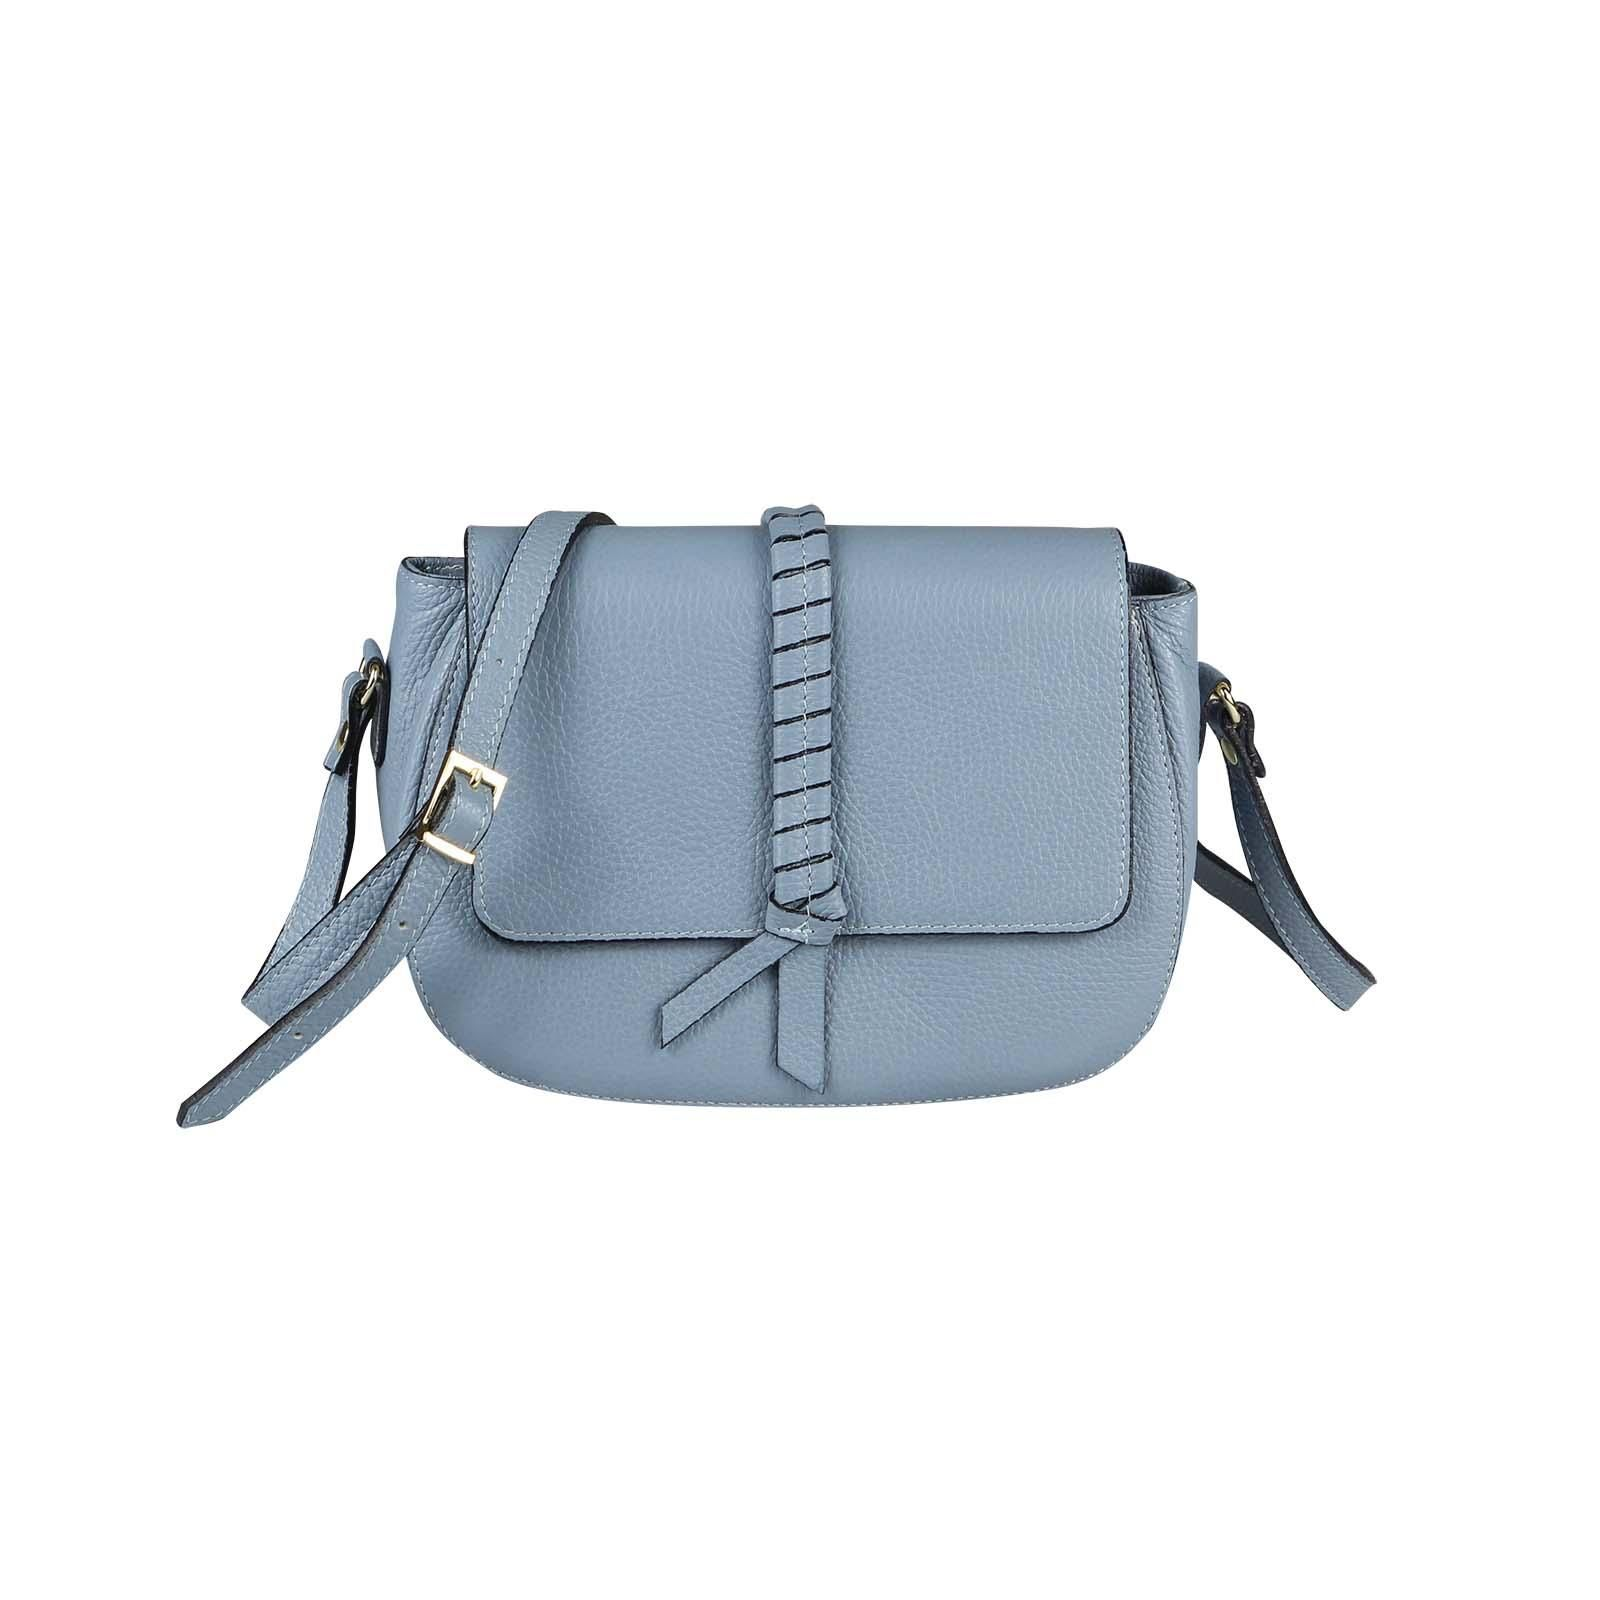 ITAL DAMEN LEDER TASCHE Handtasche Schultertasche Cross-Over Umhängetasche Bag